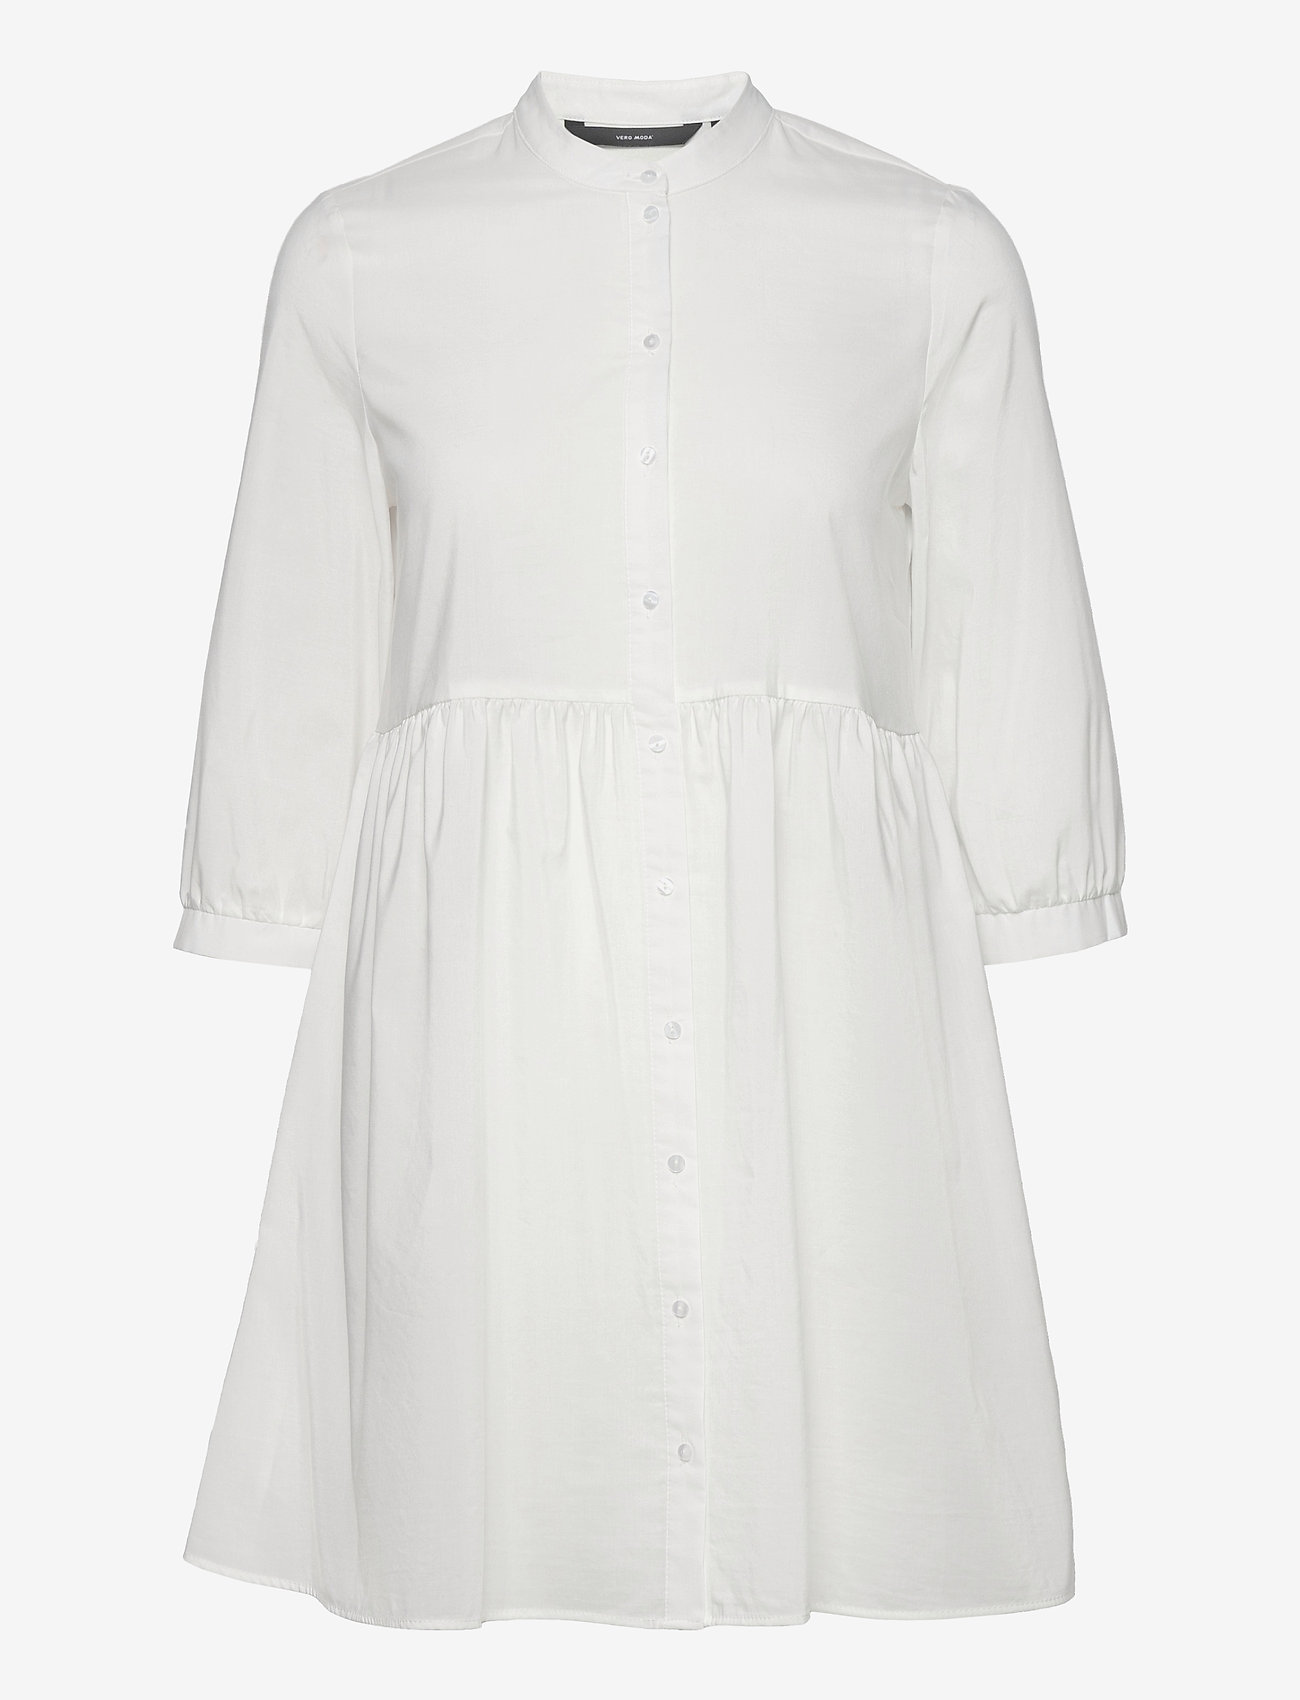 Vero Moda - VMSISI 3/4 DRESS - sommarklänningar - snow white - 0